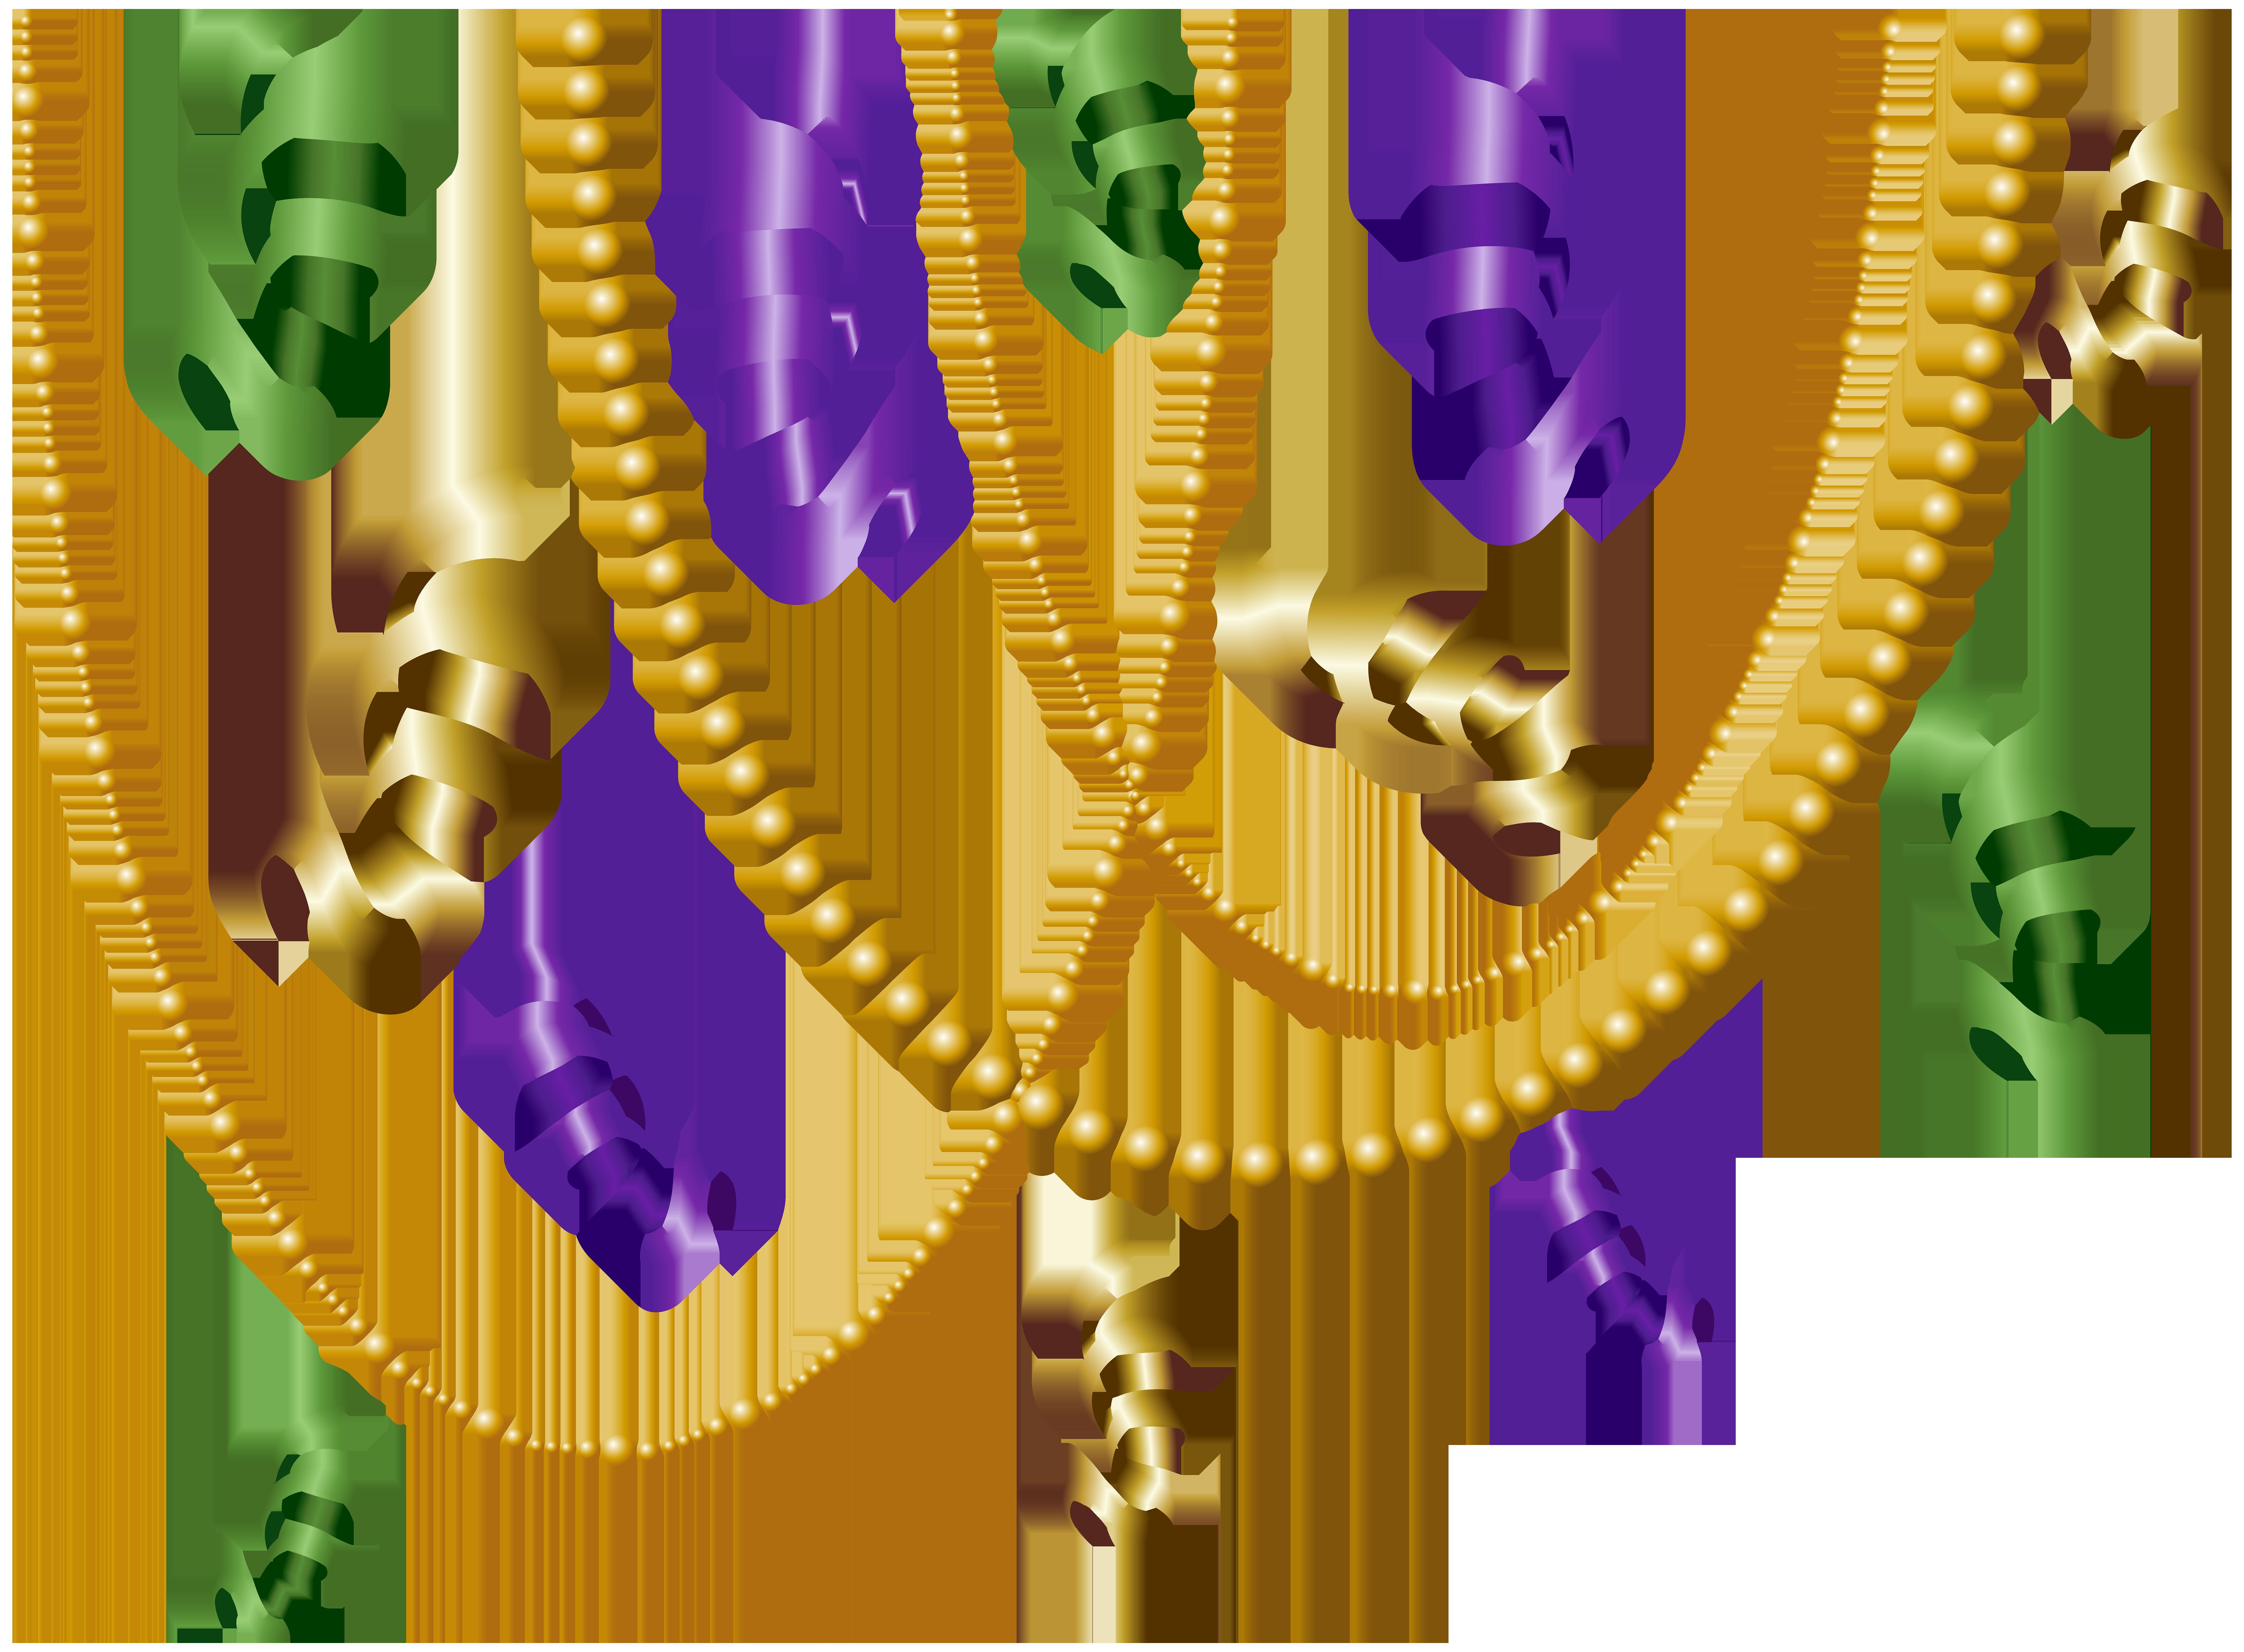 Decoration transparent clip art. Mardi gras border png